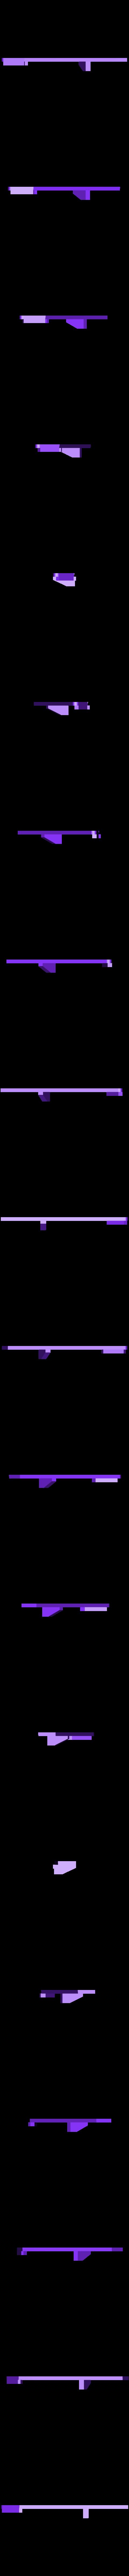 MirrorRun_Board_Back-C.STL Download free STL file 4-8-8-4 Big Boy Locomotive • 3D printer object, RaymondDeLuca